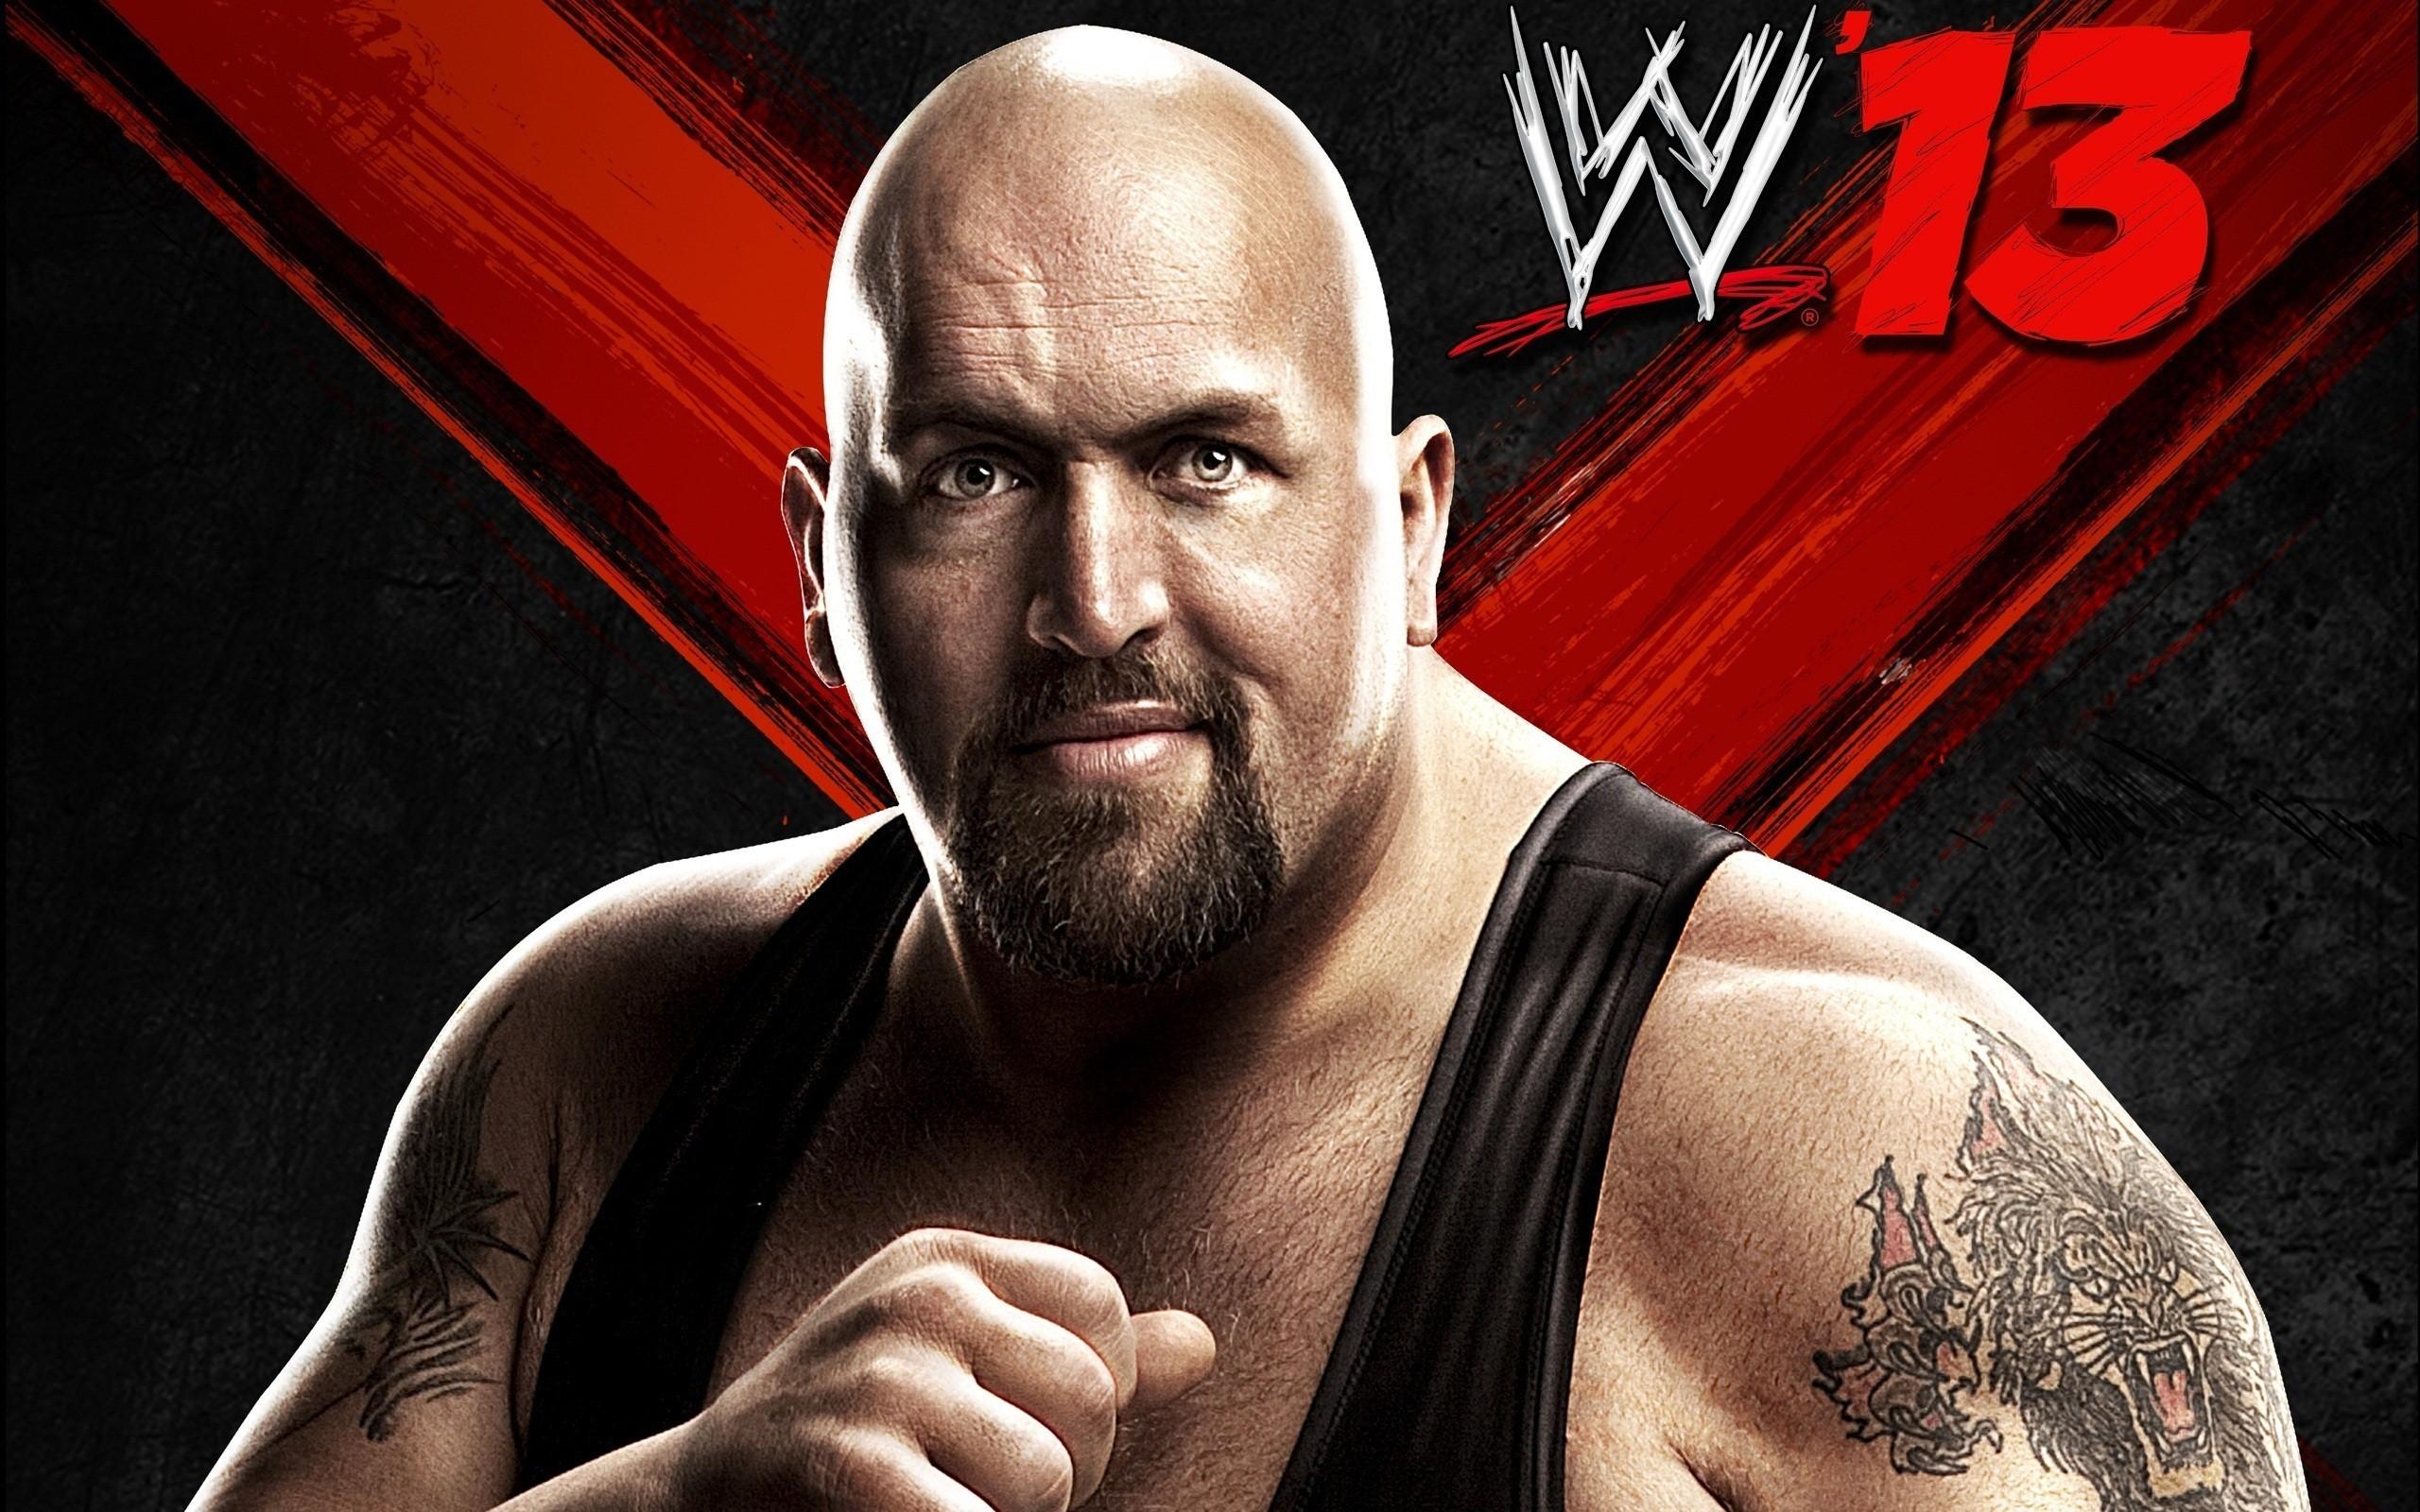 WWE Big Show HD Wallpapers 2560x1600